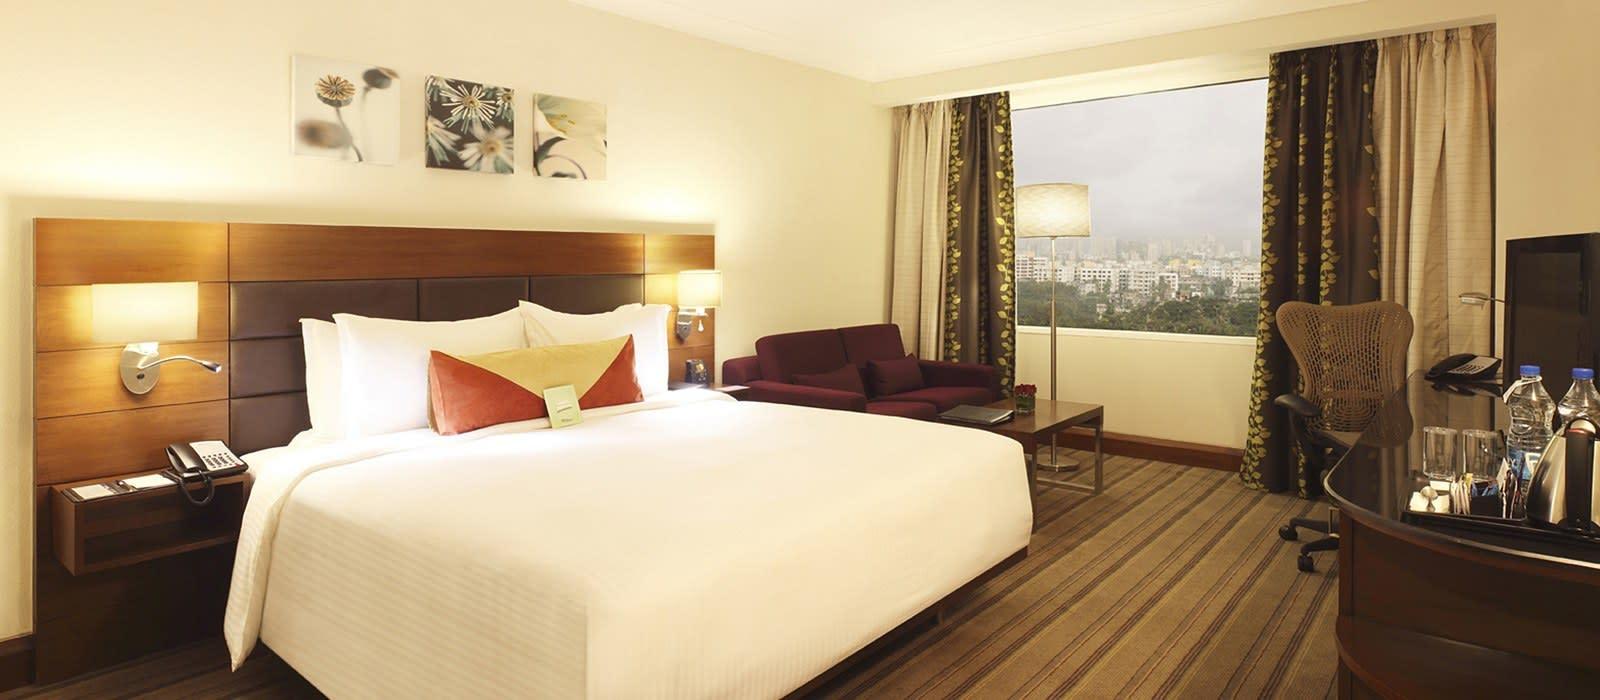 Hotel Hilton Garden Inn Nordindien